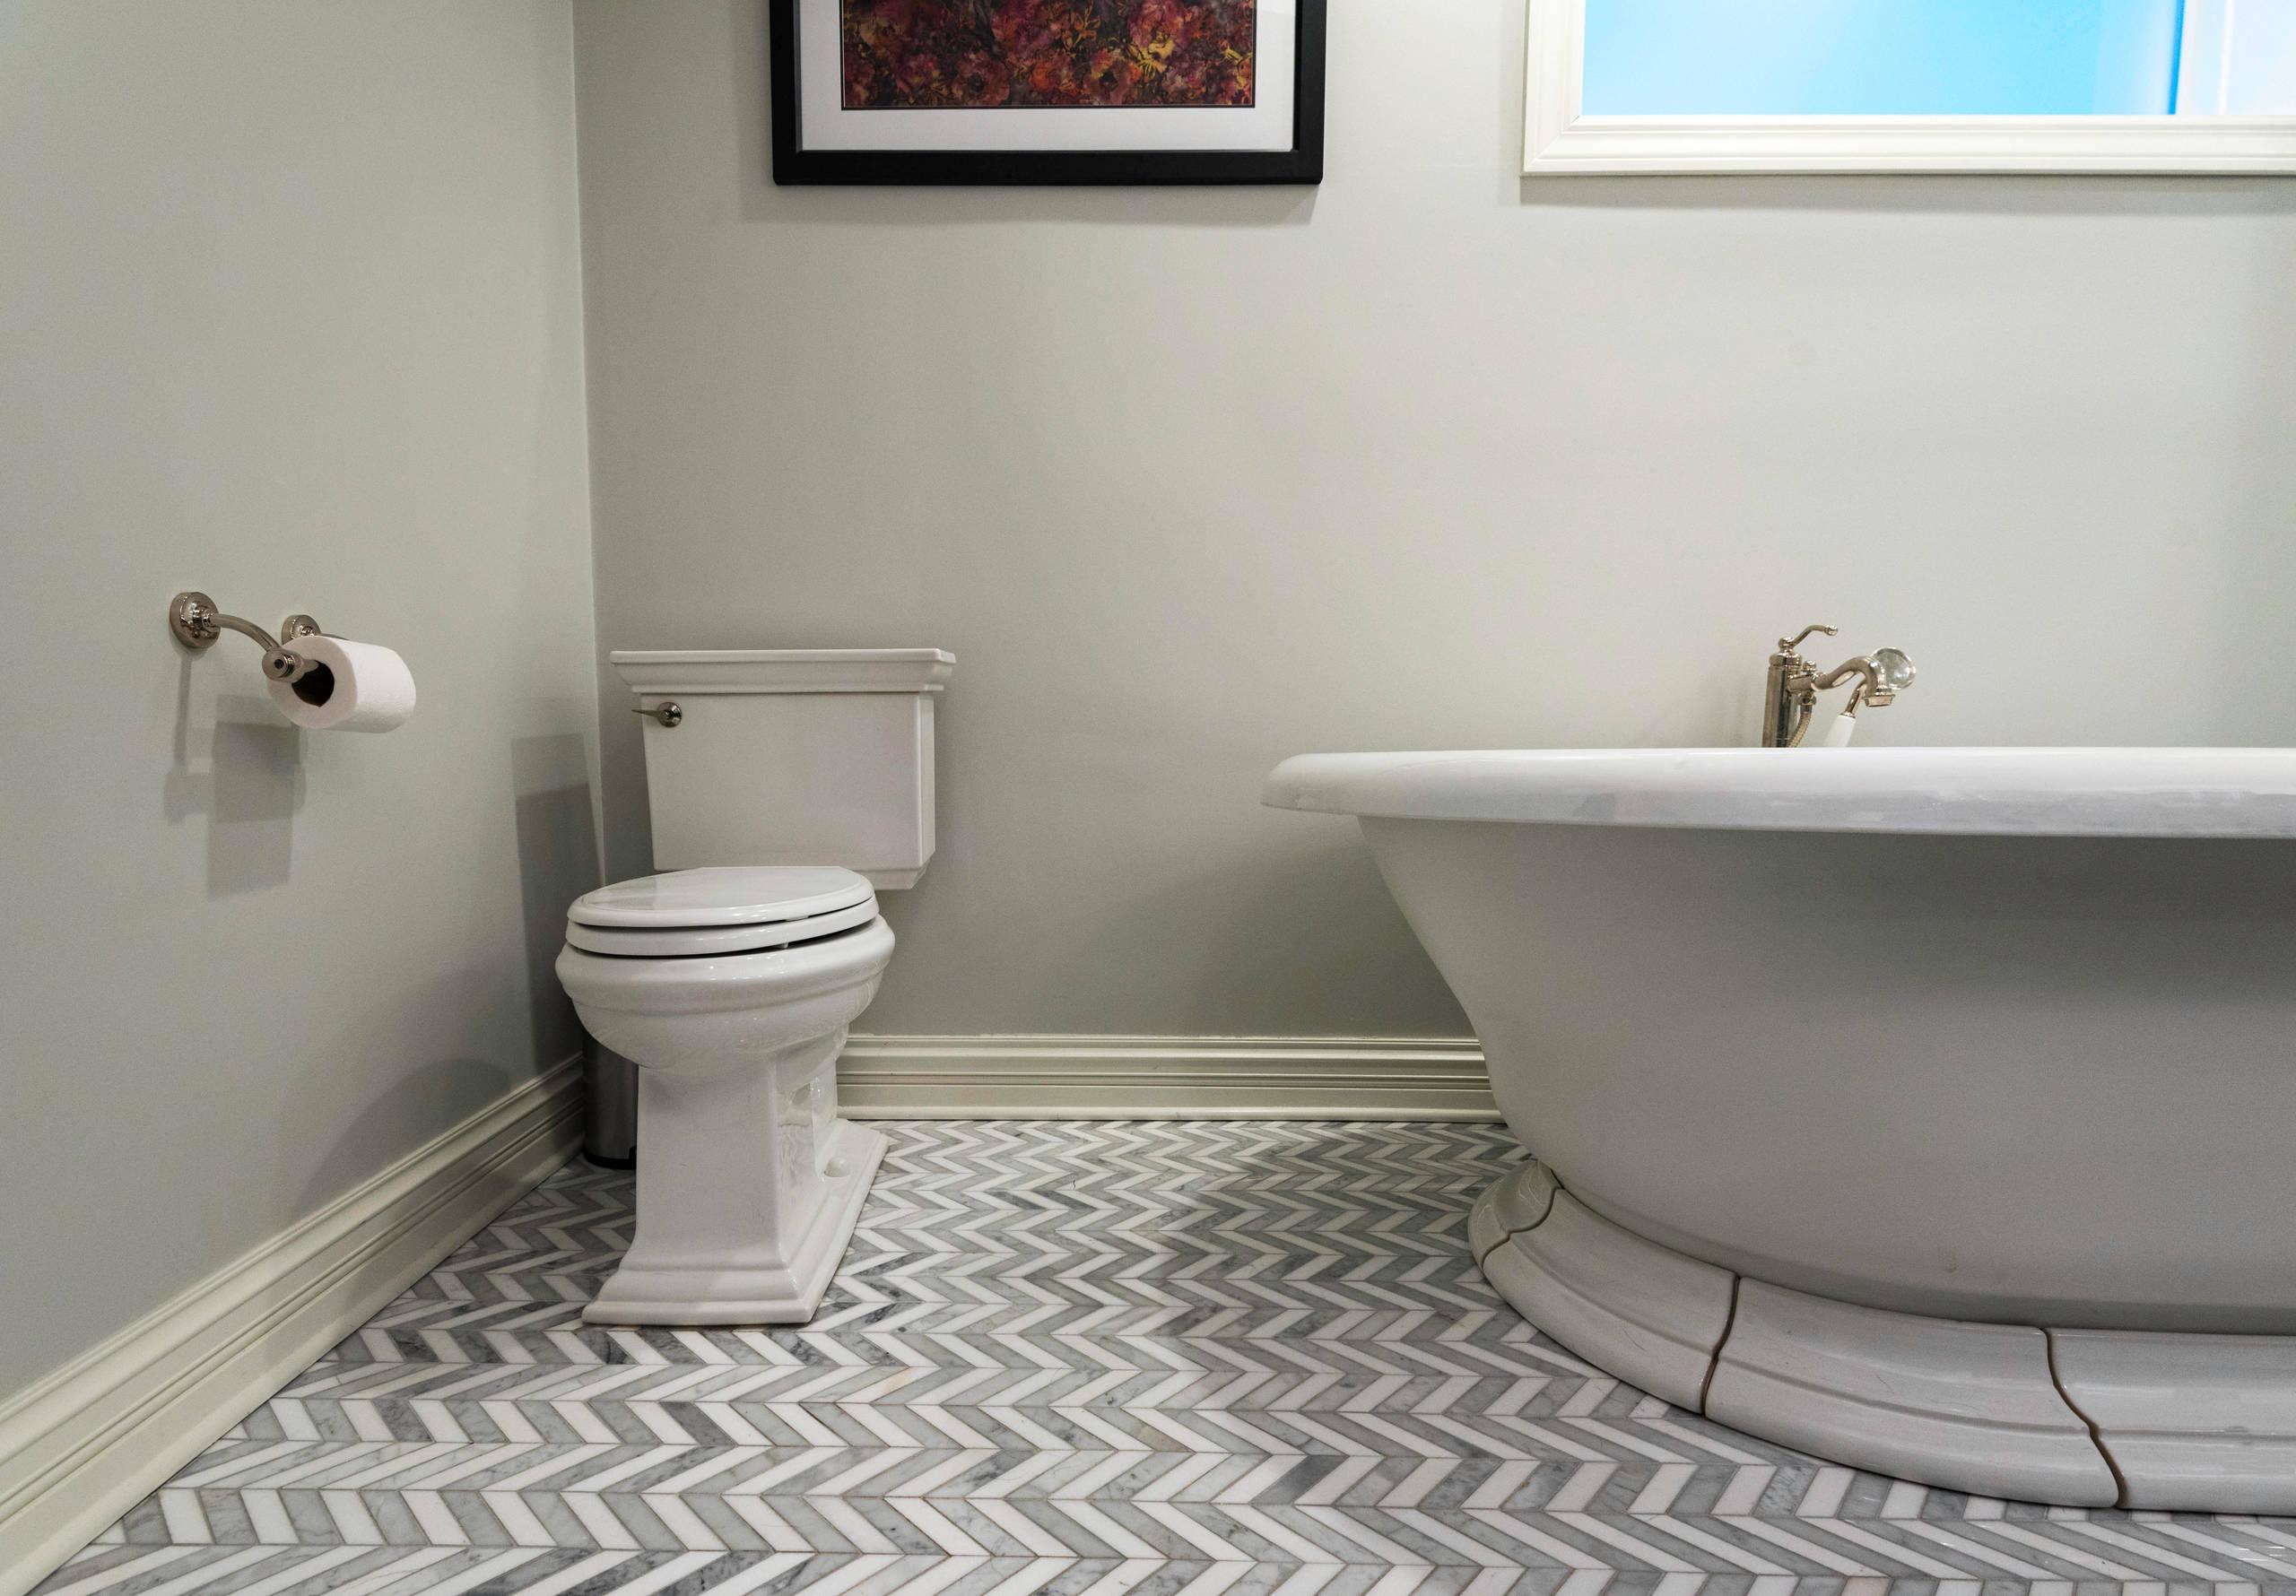 North Side Master Bathroom